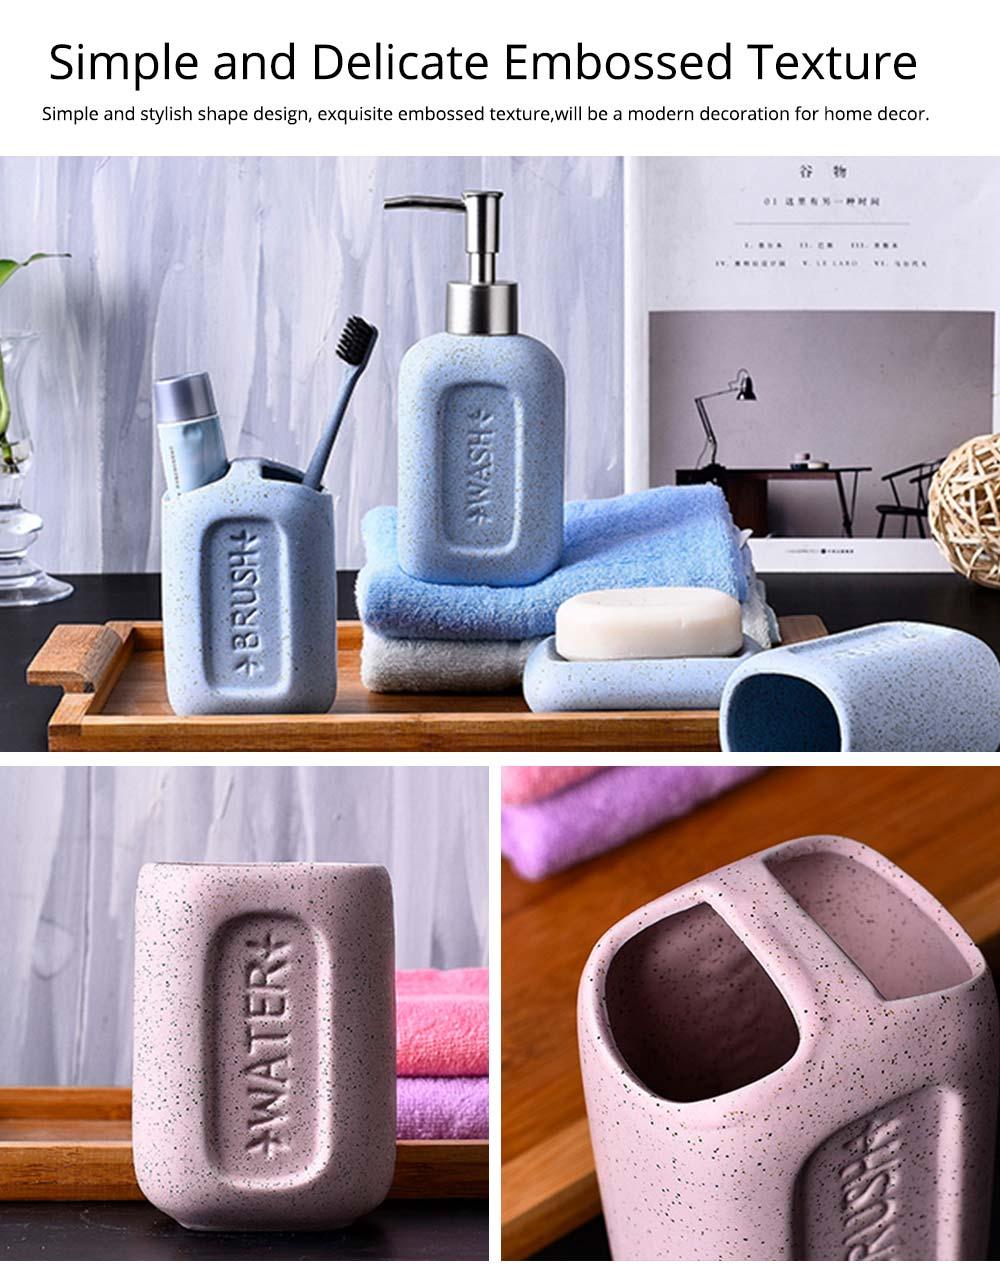 Creative European Ceramic Bathroom Supplies 4 pieces Set Concave Letter Printed Sanitary Ware 2